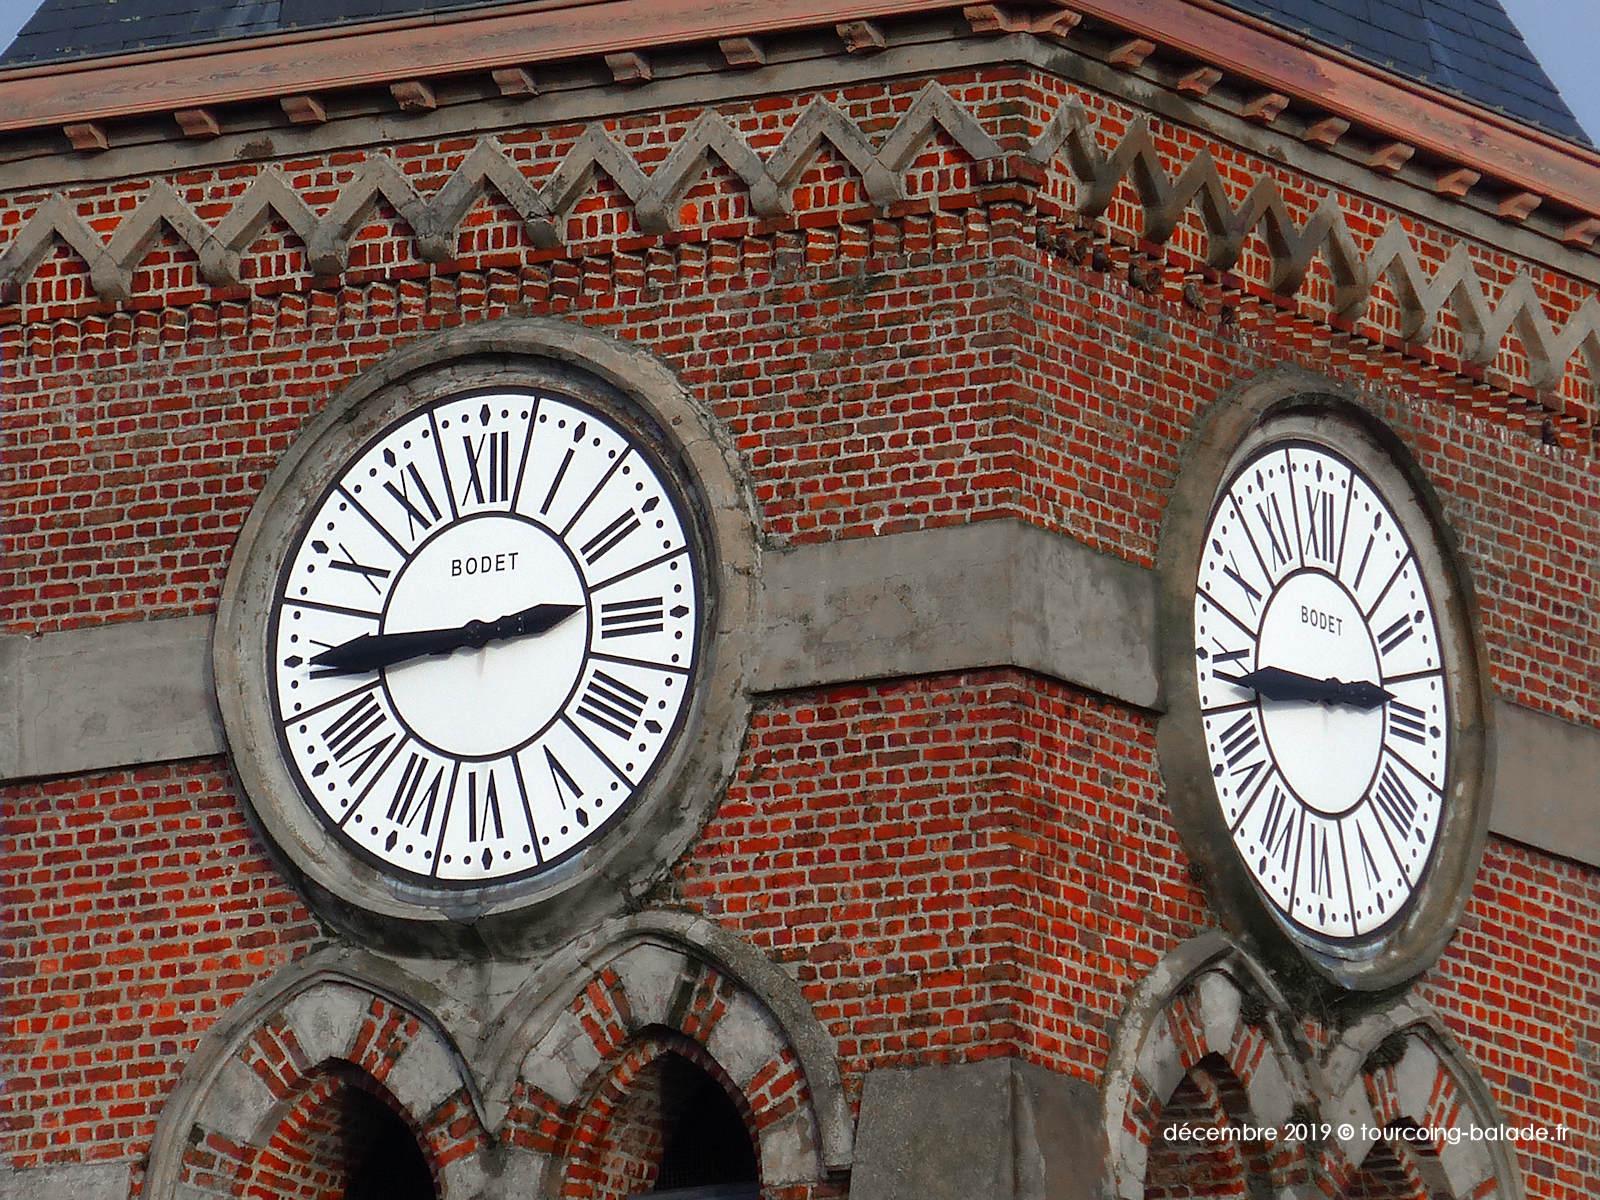 Horloge Bodet, Saint-Alphone, Halluin